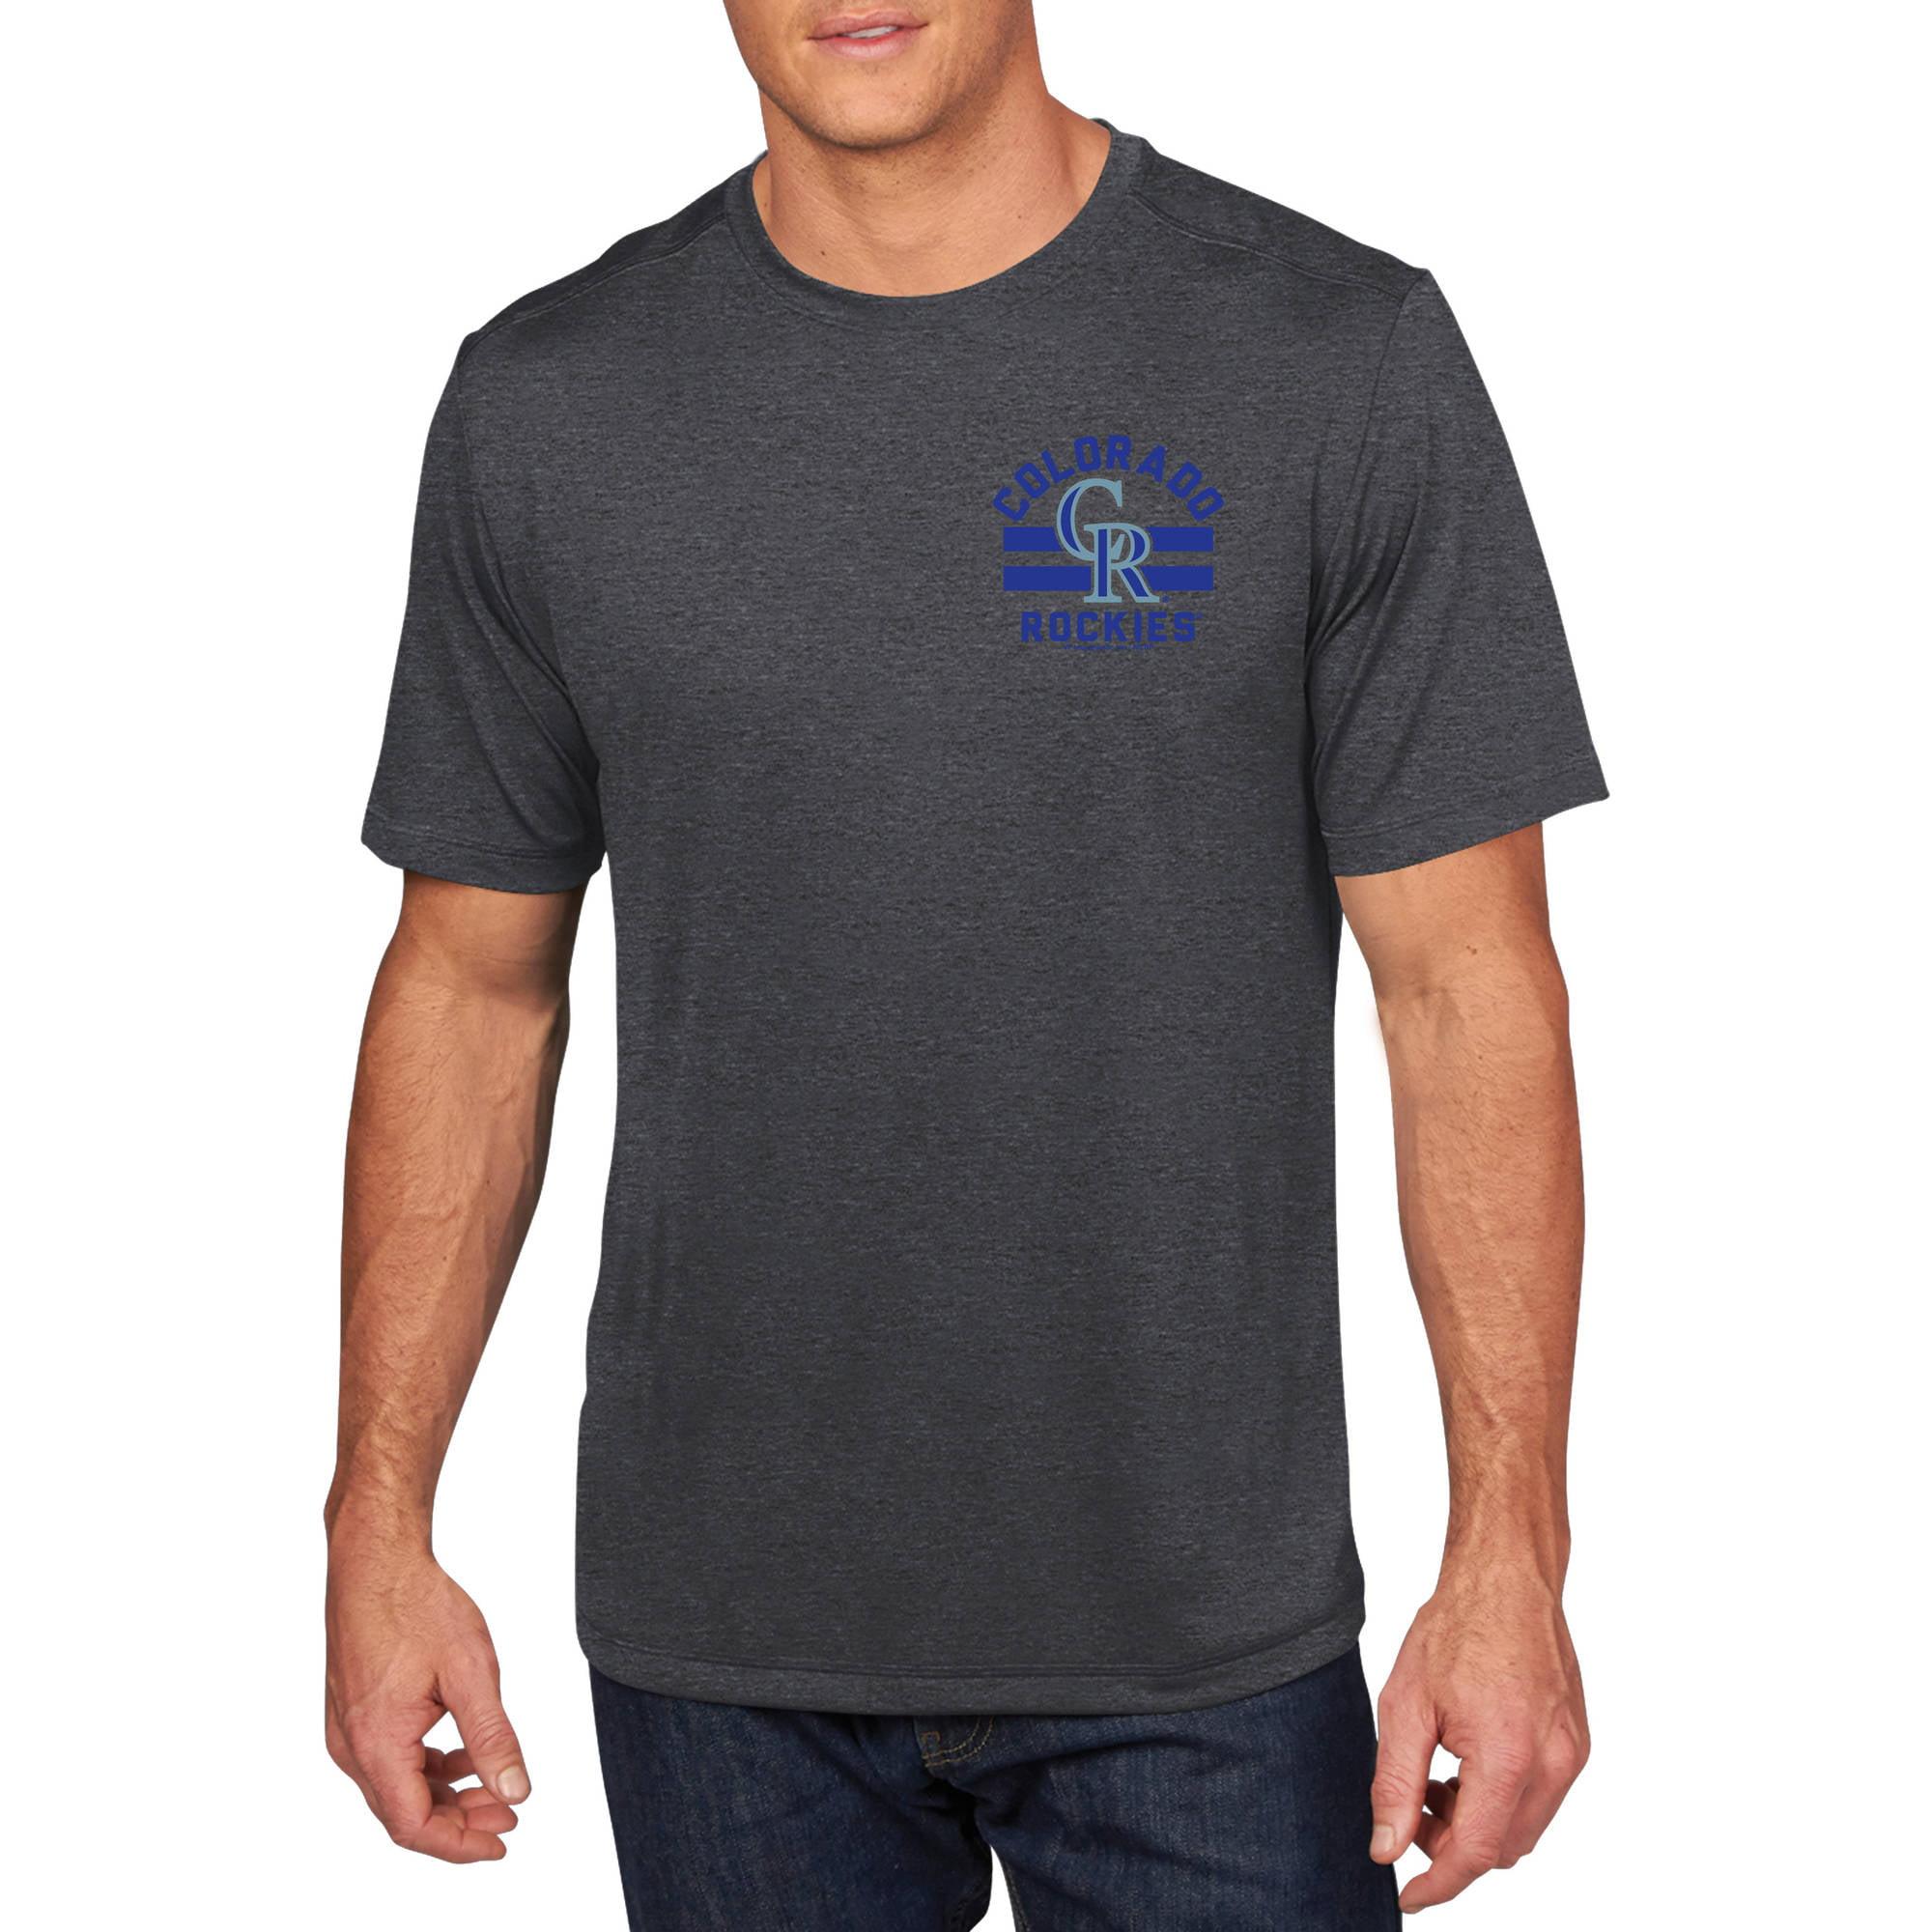 MLB - Mens Colorado Rockies Short Sleeve Synthetic Team Tee